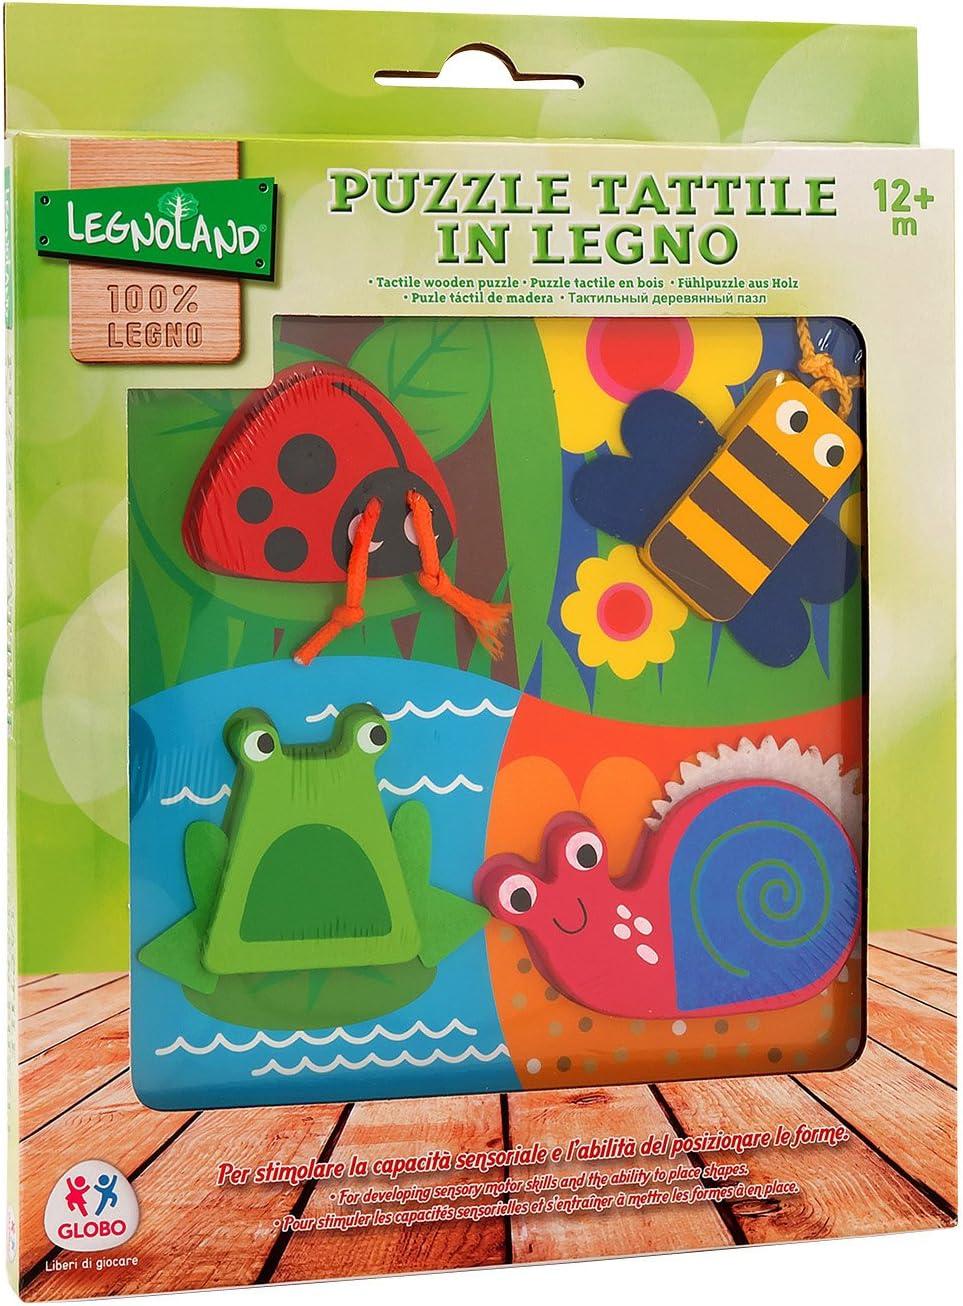 20 x 20 x 1.7 cm Globo 37762 Legnoland Wooden Puzzle with Fabric Multi-Color